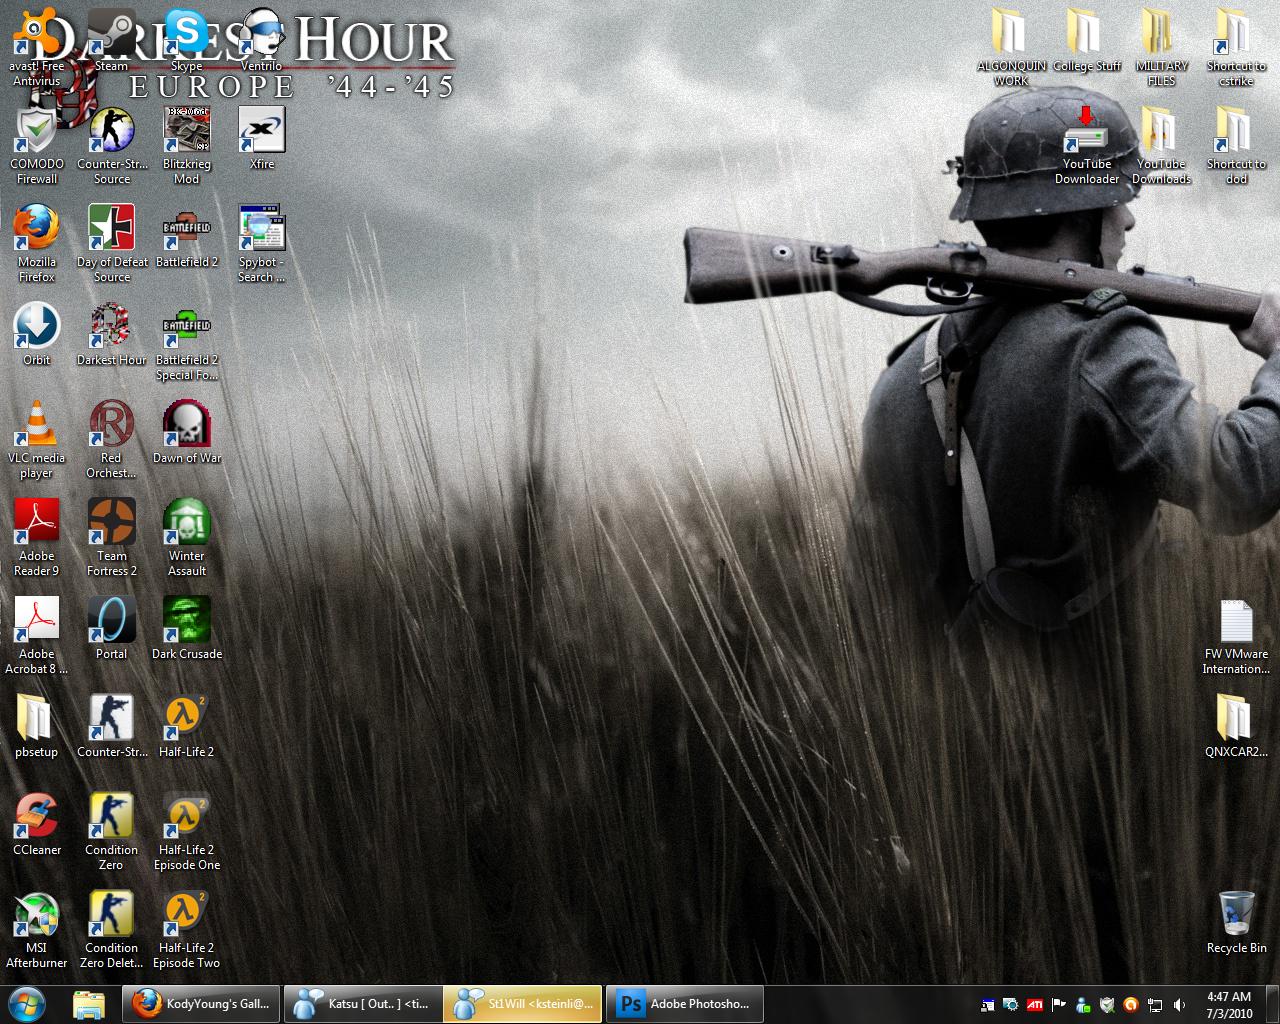 Desktop 2010 By Kodyyoung On Deviantart